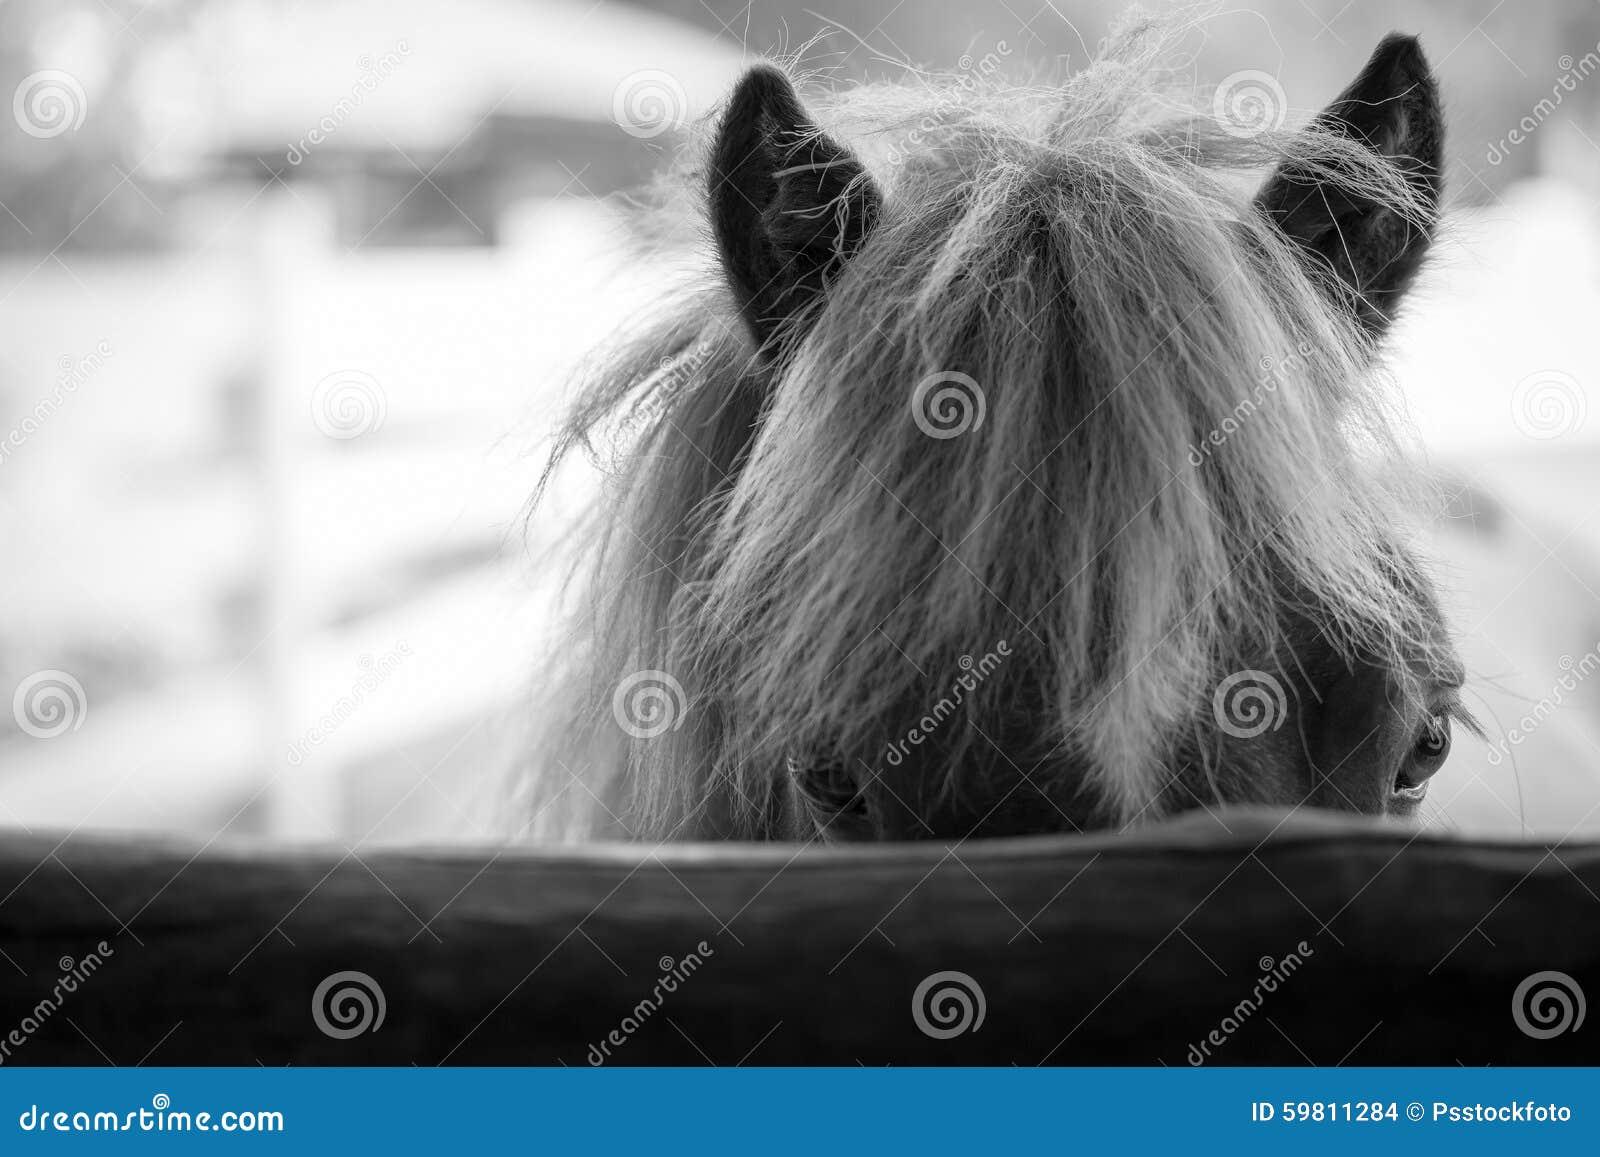 Black horse face close up - photo#21